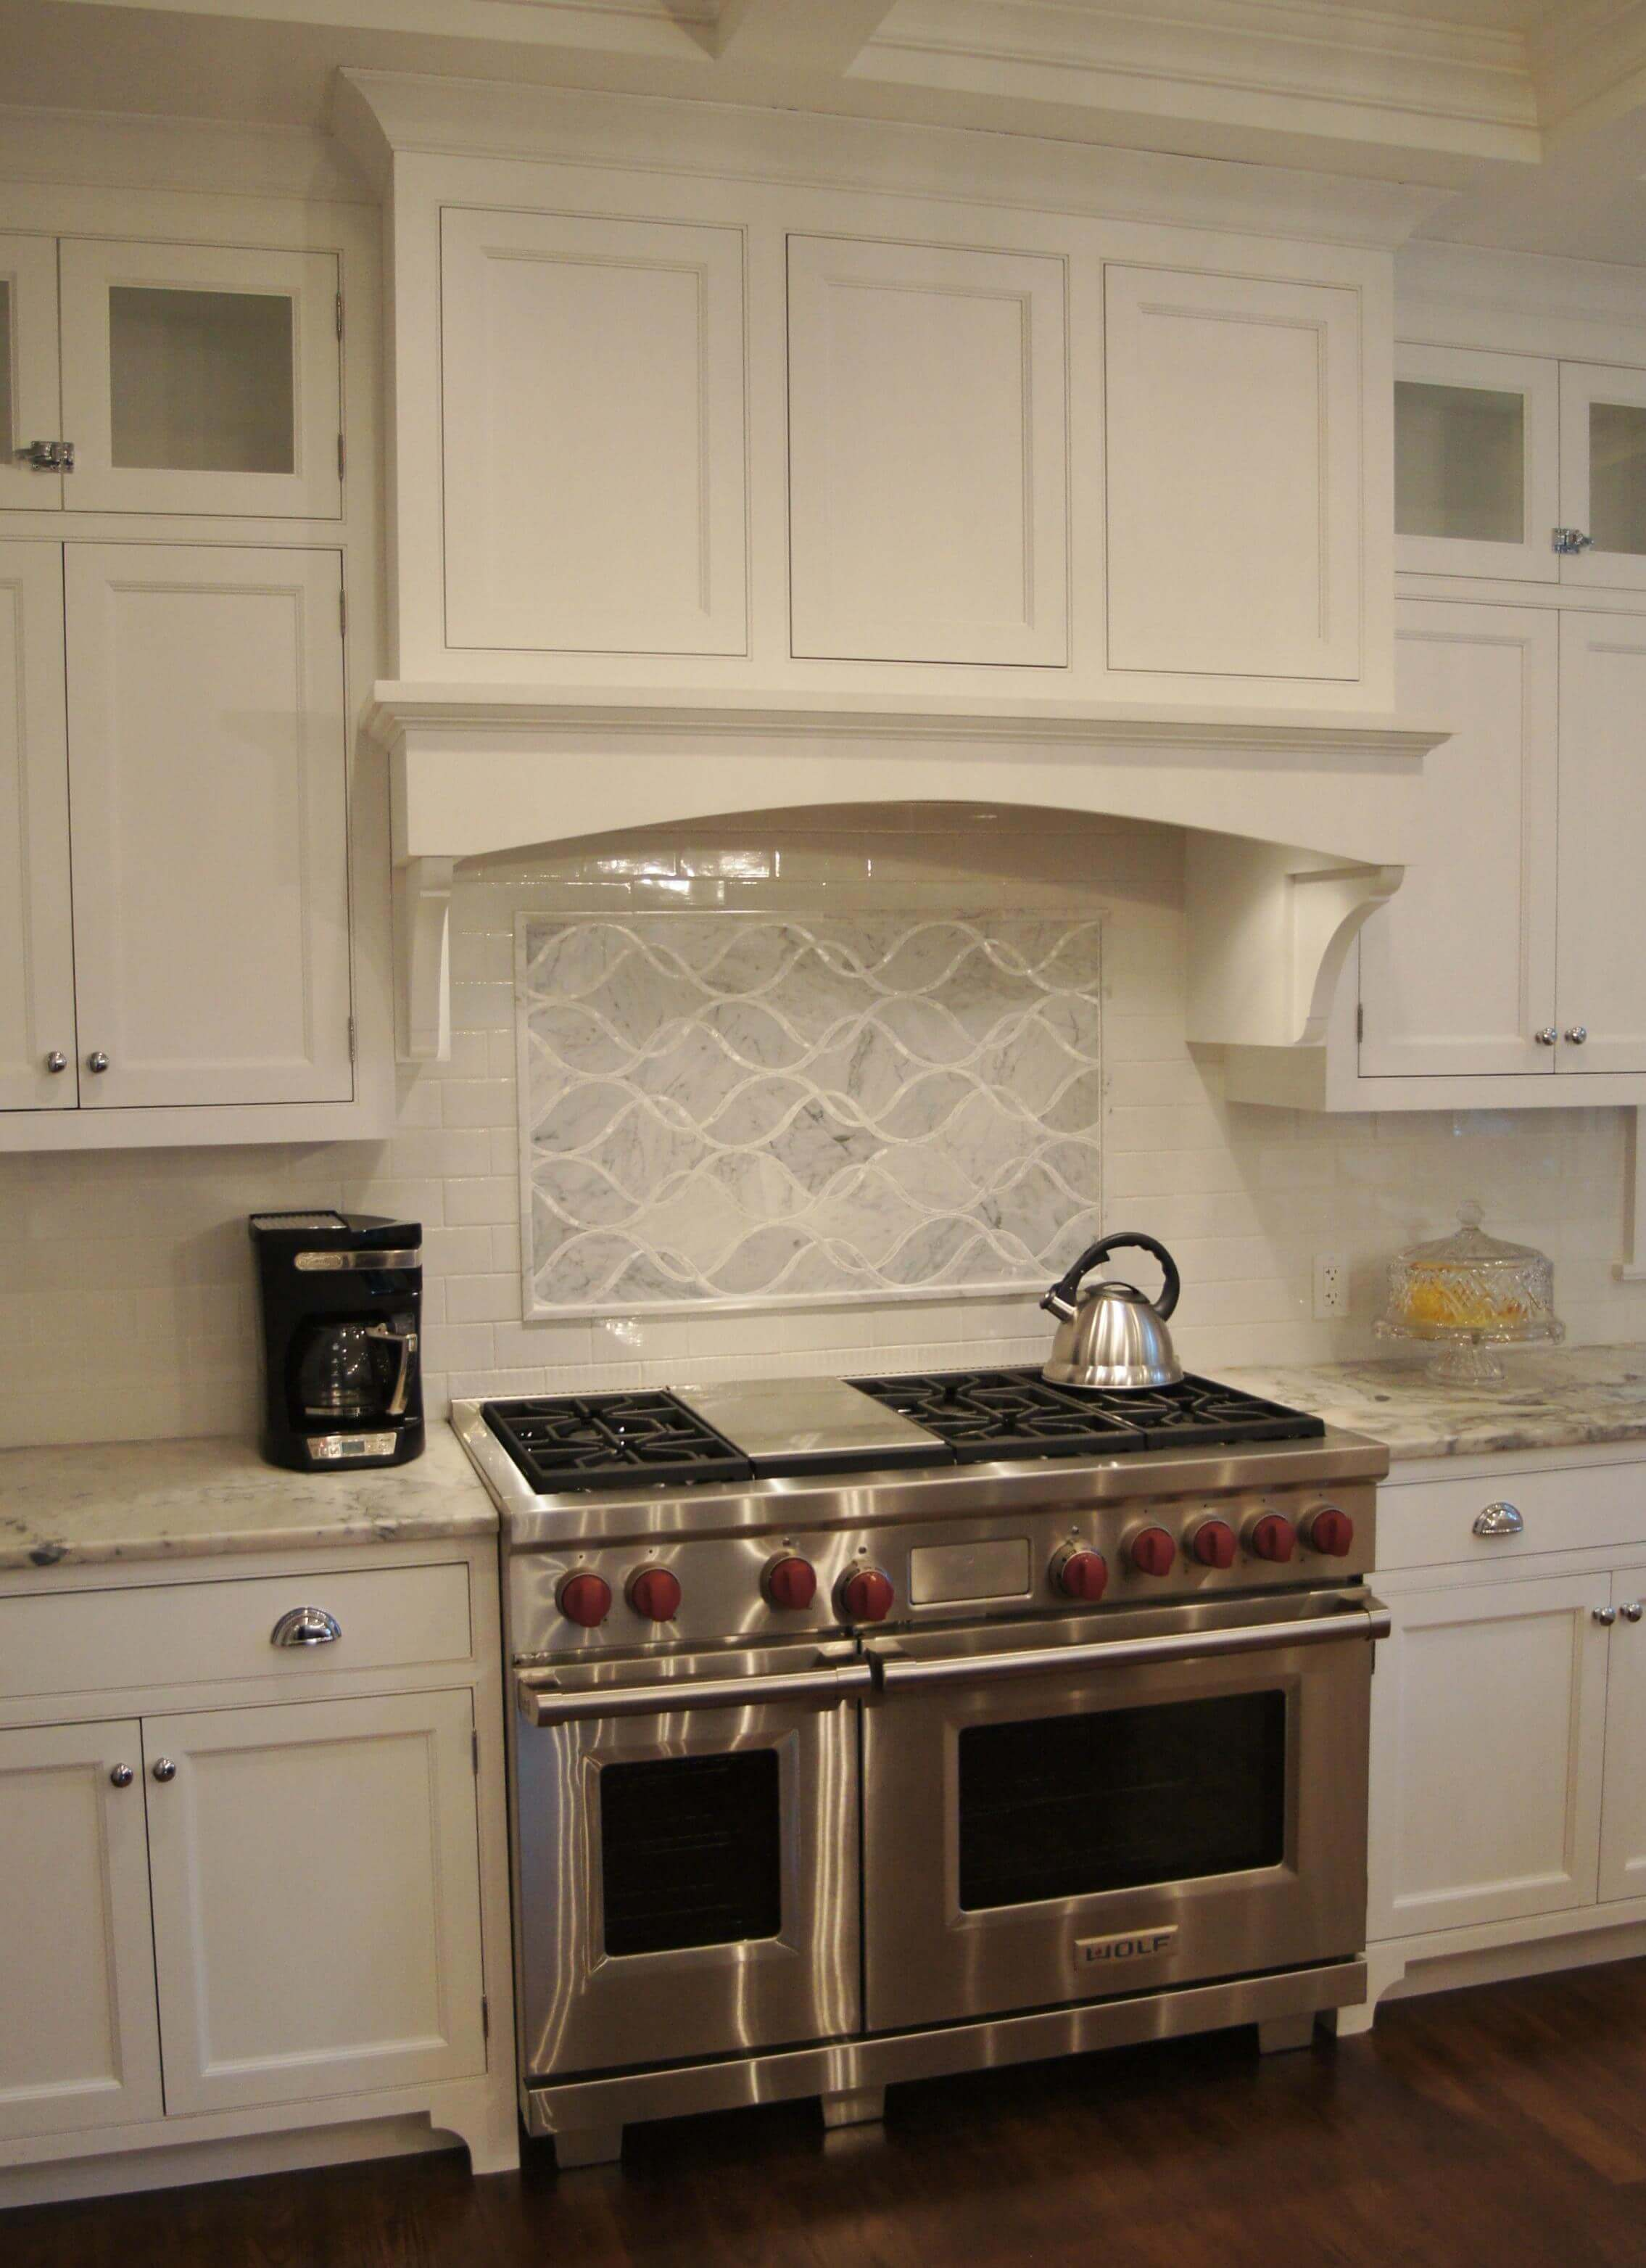 Claridges Byrd Tile Kitchens